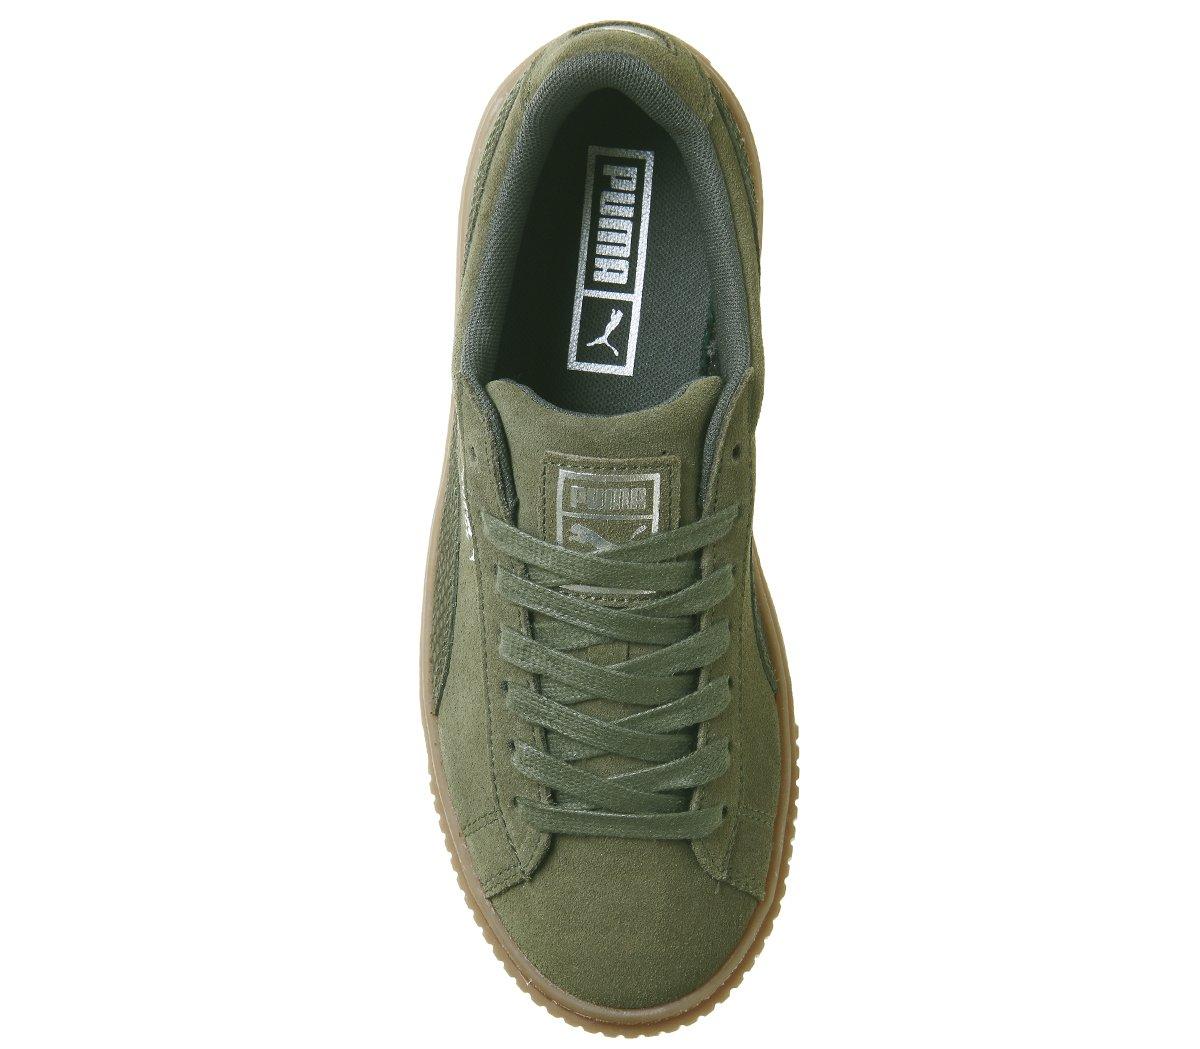 Puma Sneaker Damen Basket Platform Metallic Sneaker Puma Olive Night Silver (Kaki) f4fa53